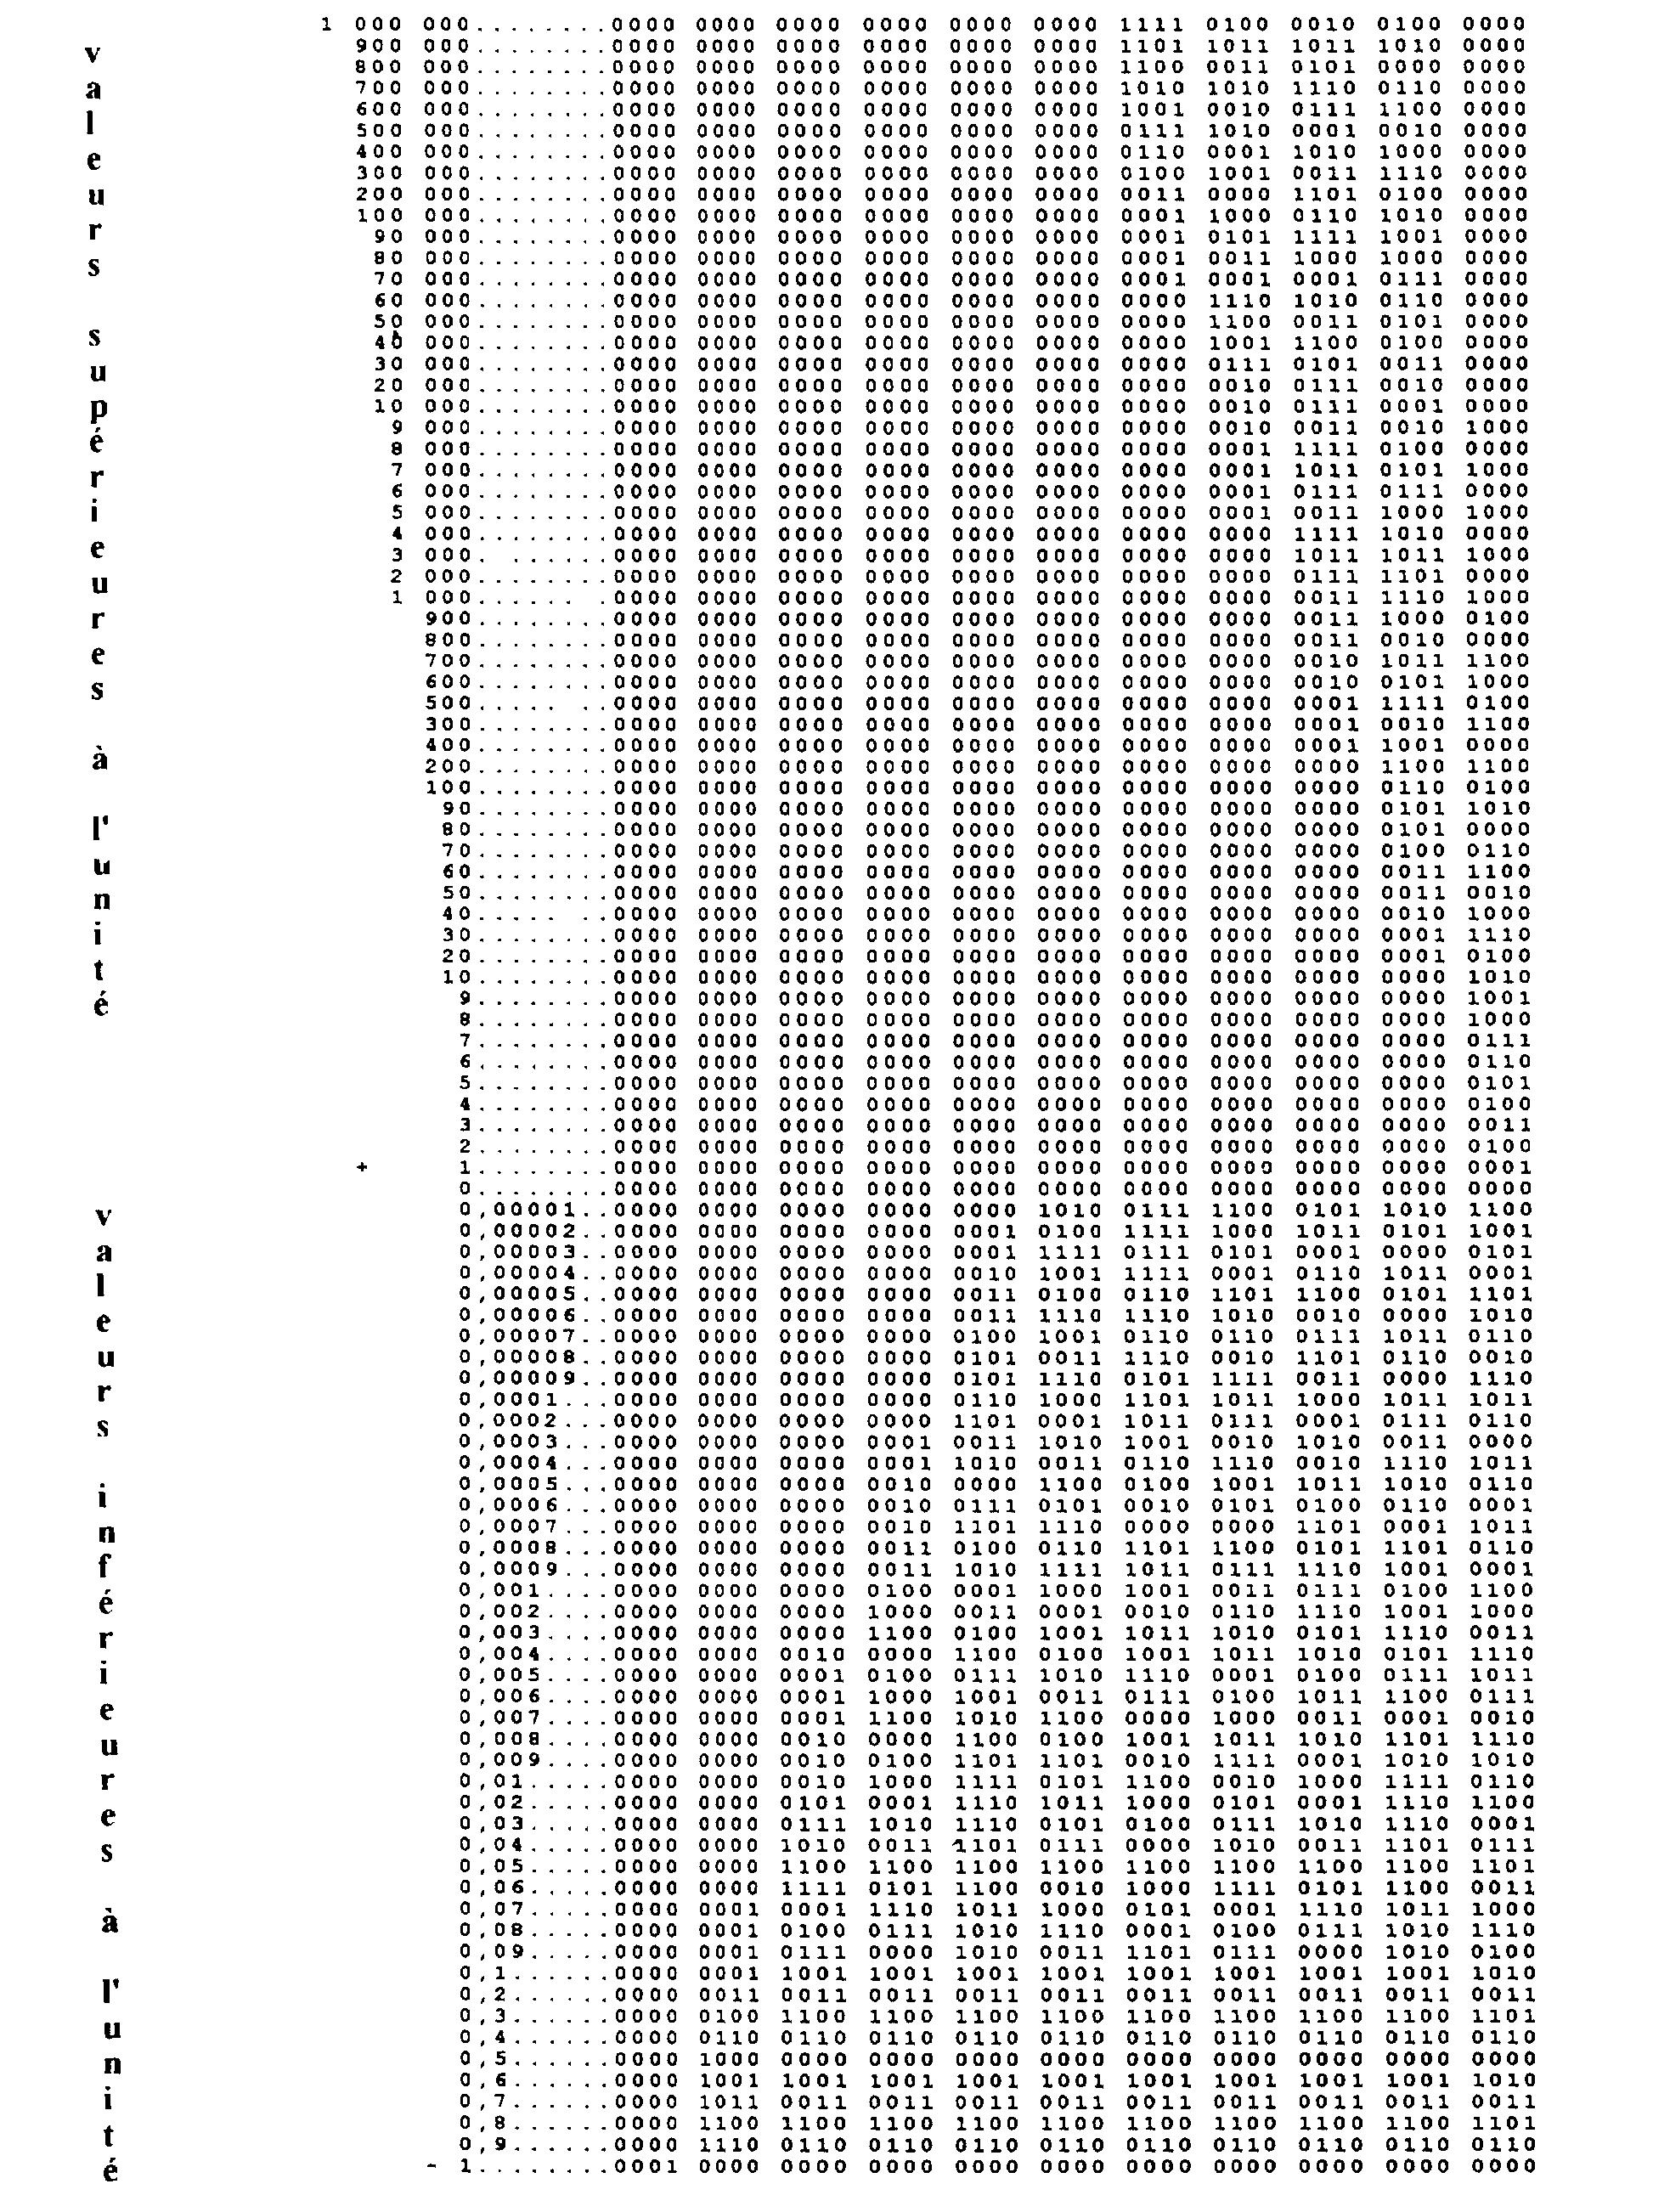 051-121M Monochrome A4 Die Cut 3D Decoupage Sheet